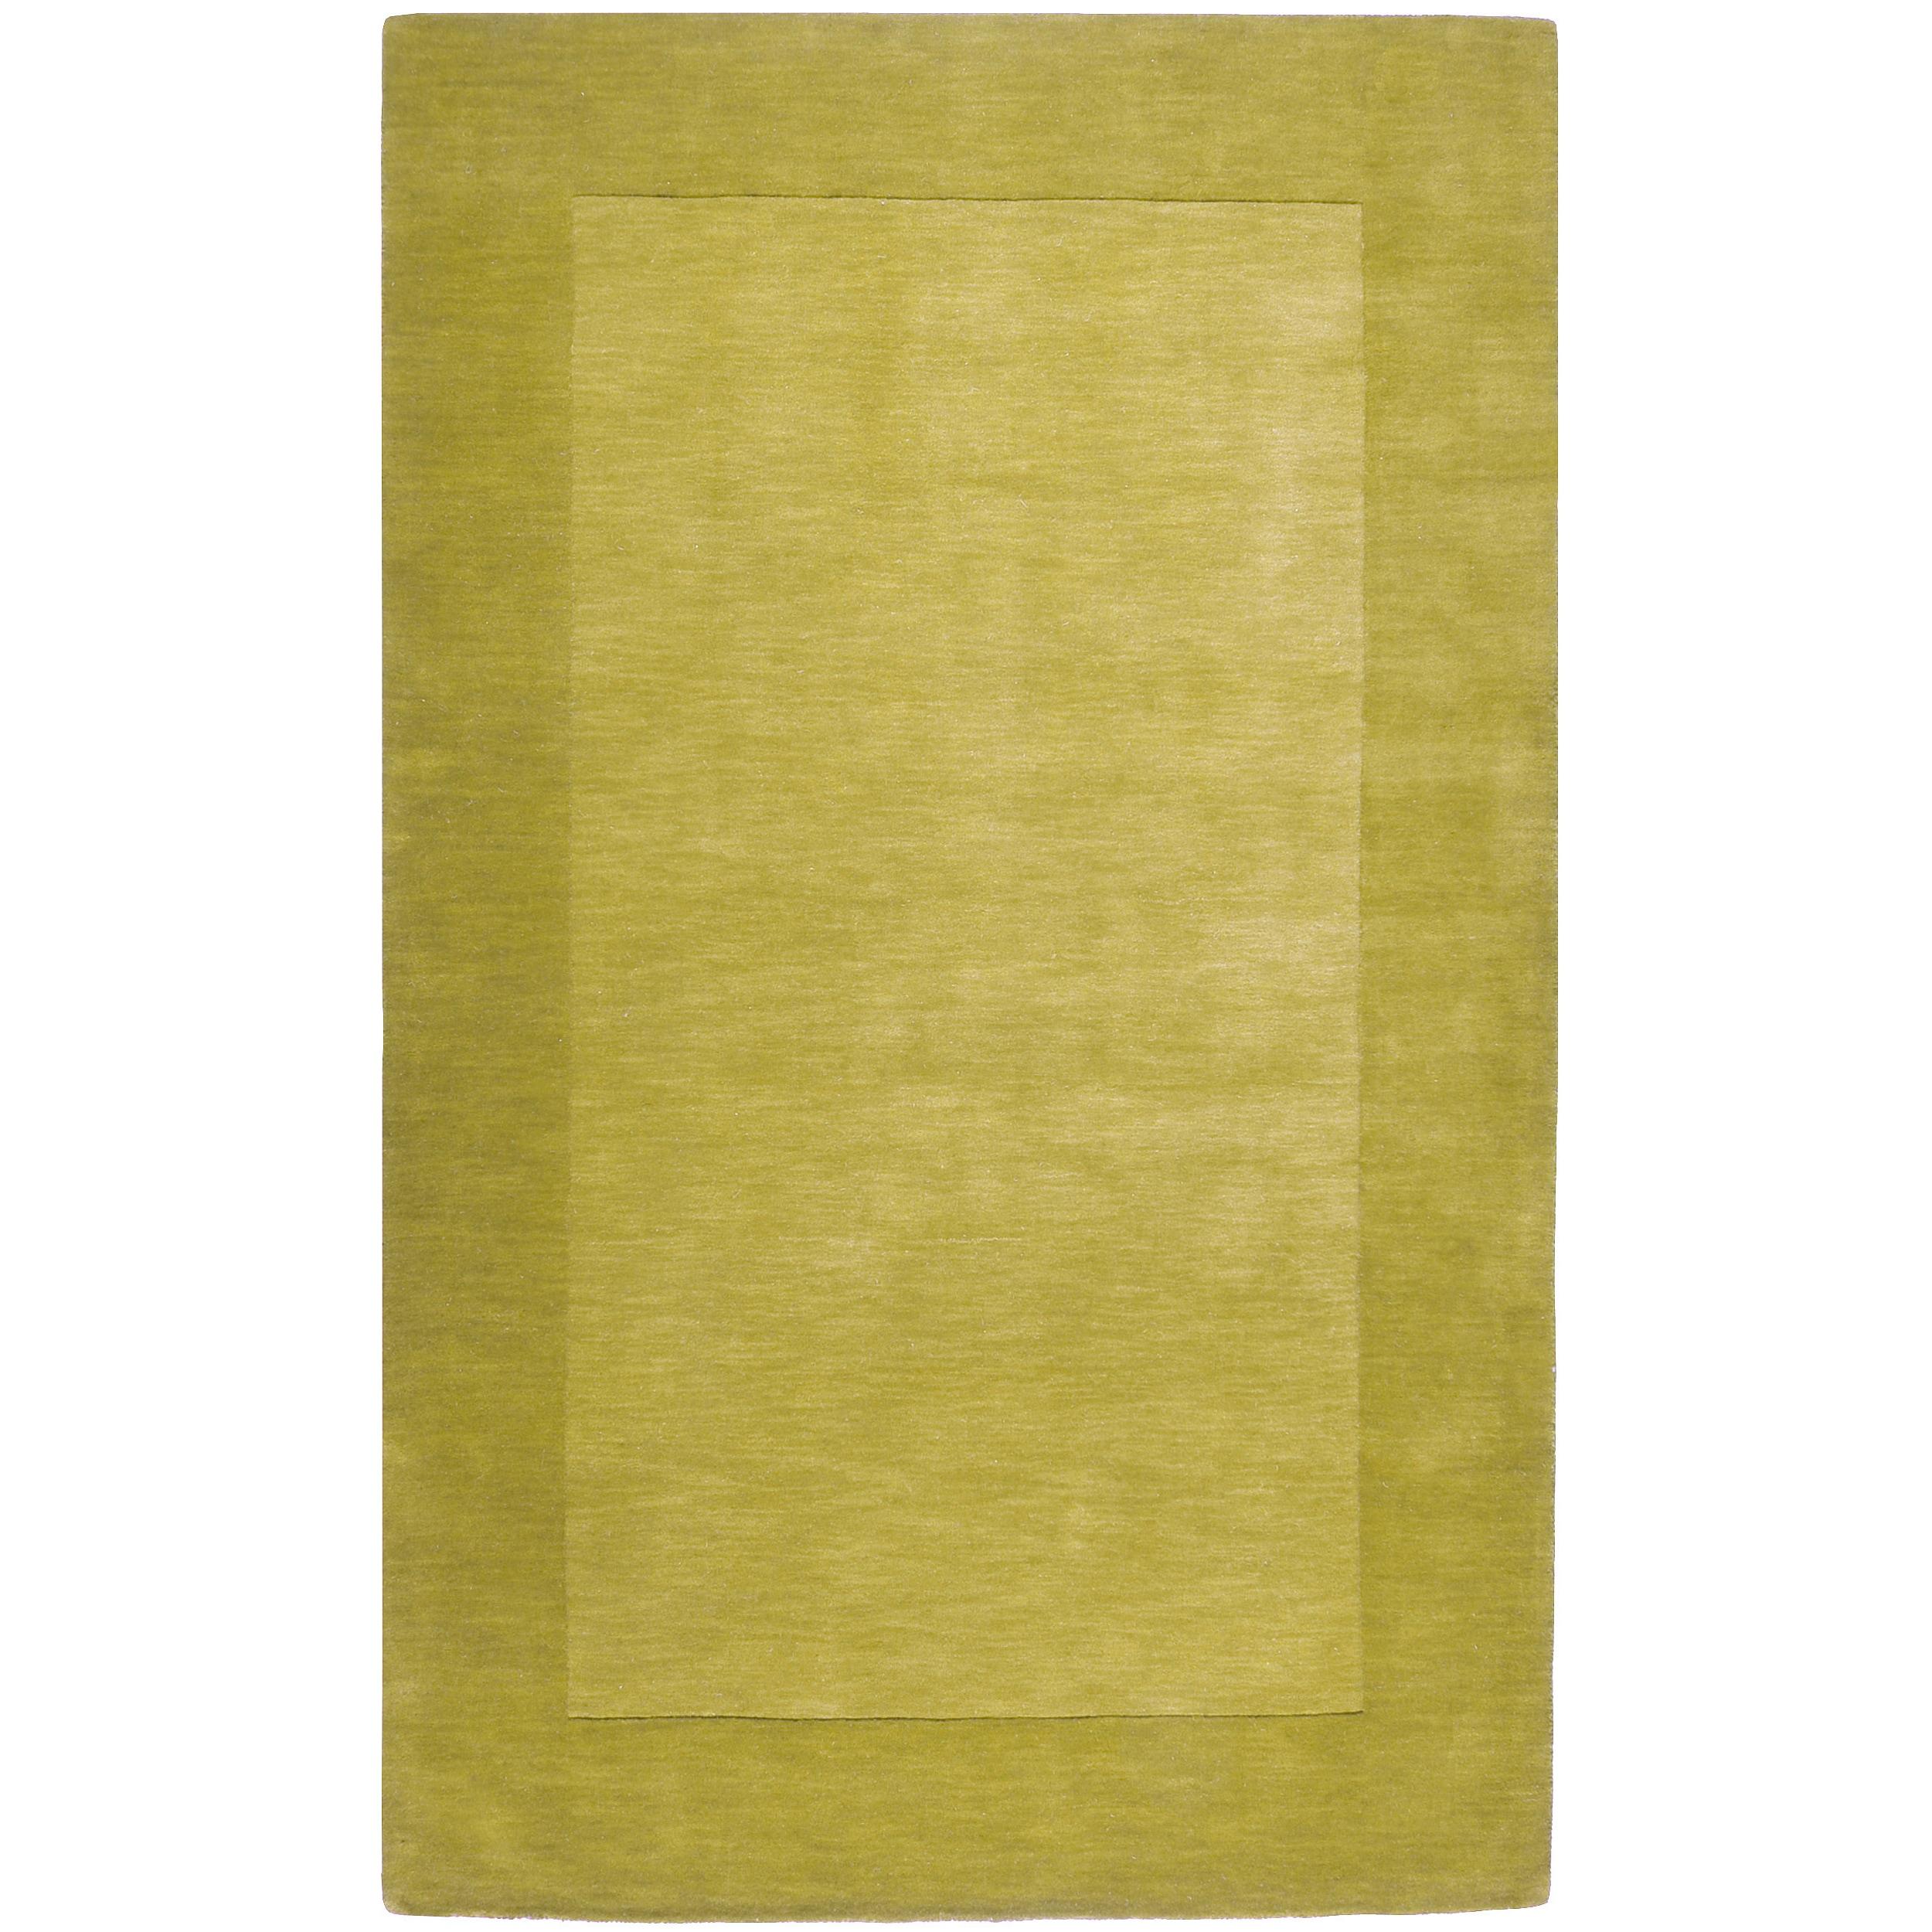 Hand-crafted Green Tone-On-Tone Bordered Eluro Wool Rug (9' x 13')